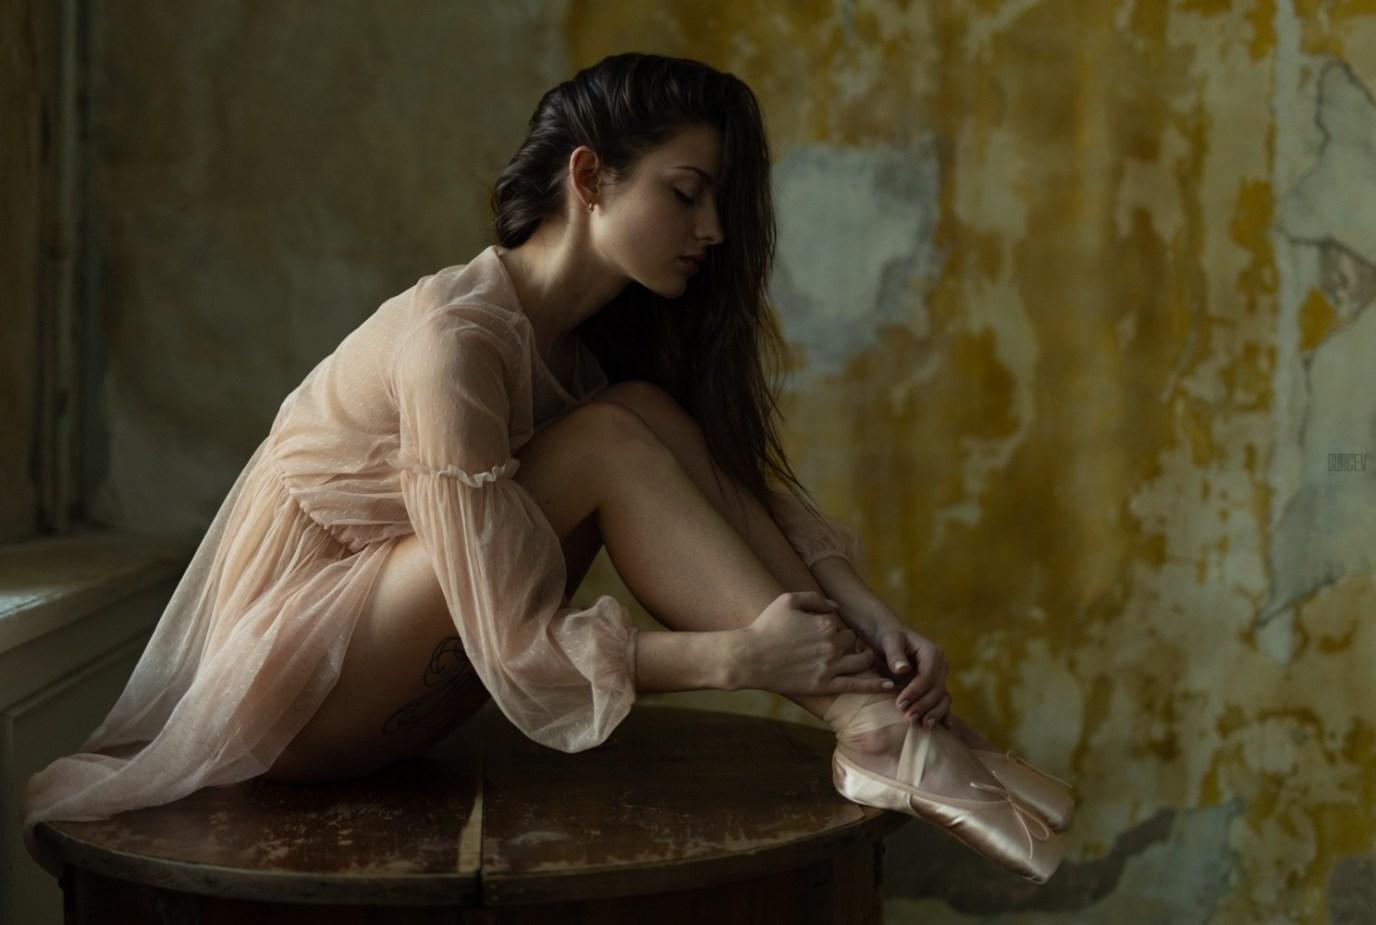 Ana Walczak Nude aleksey burcev - portraits of girls